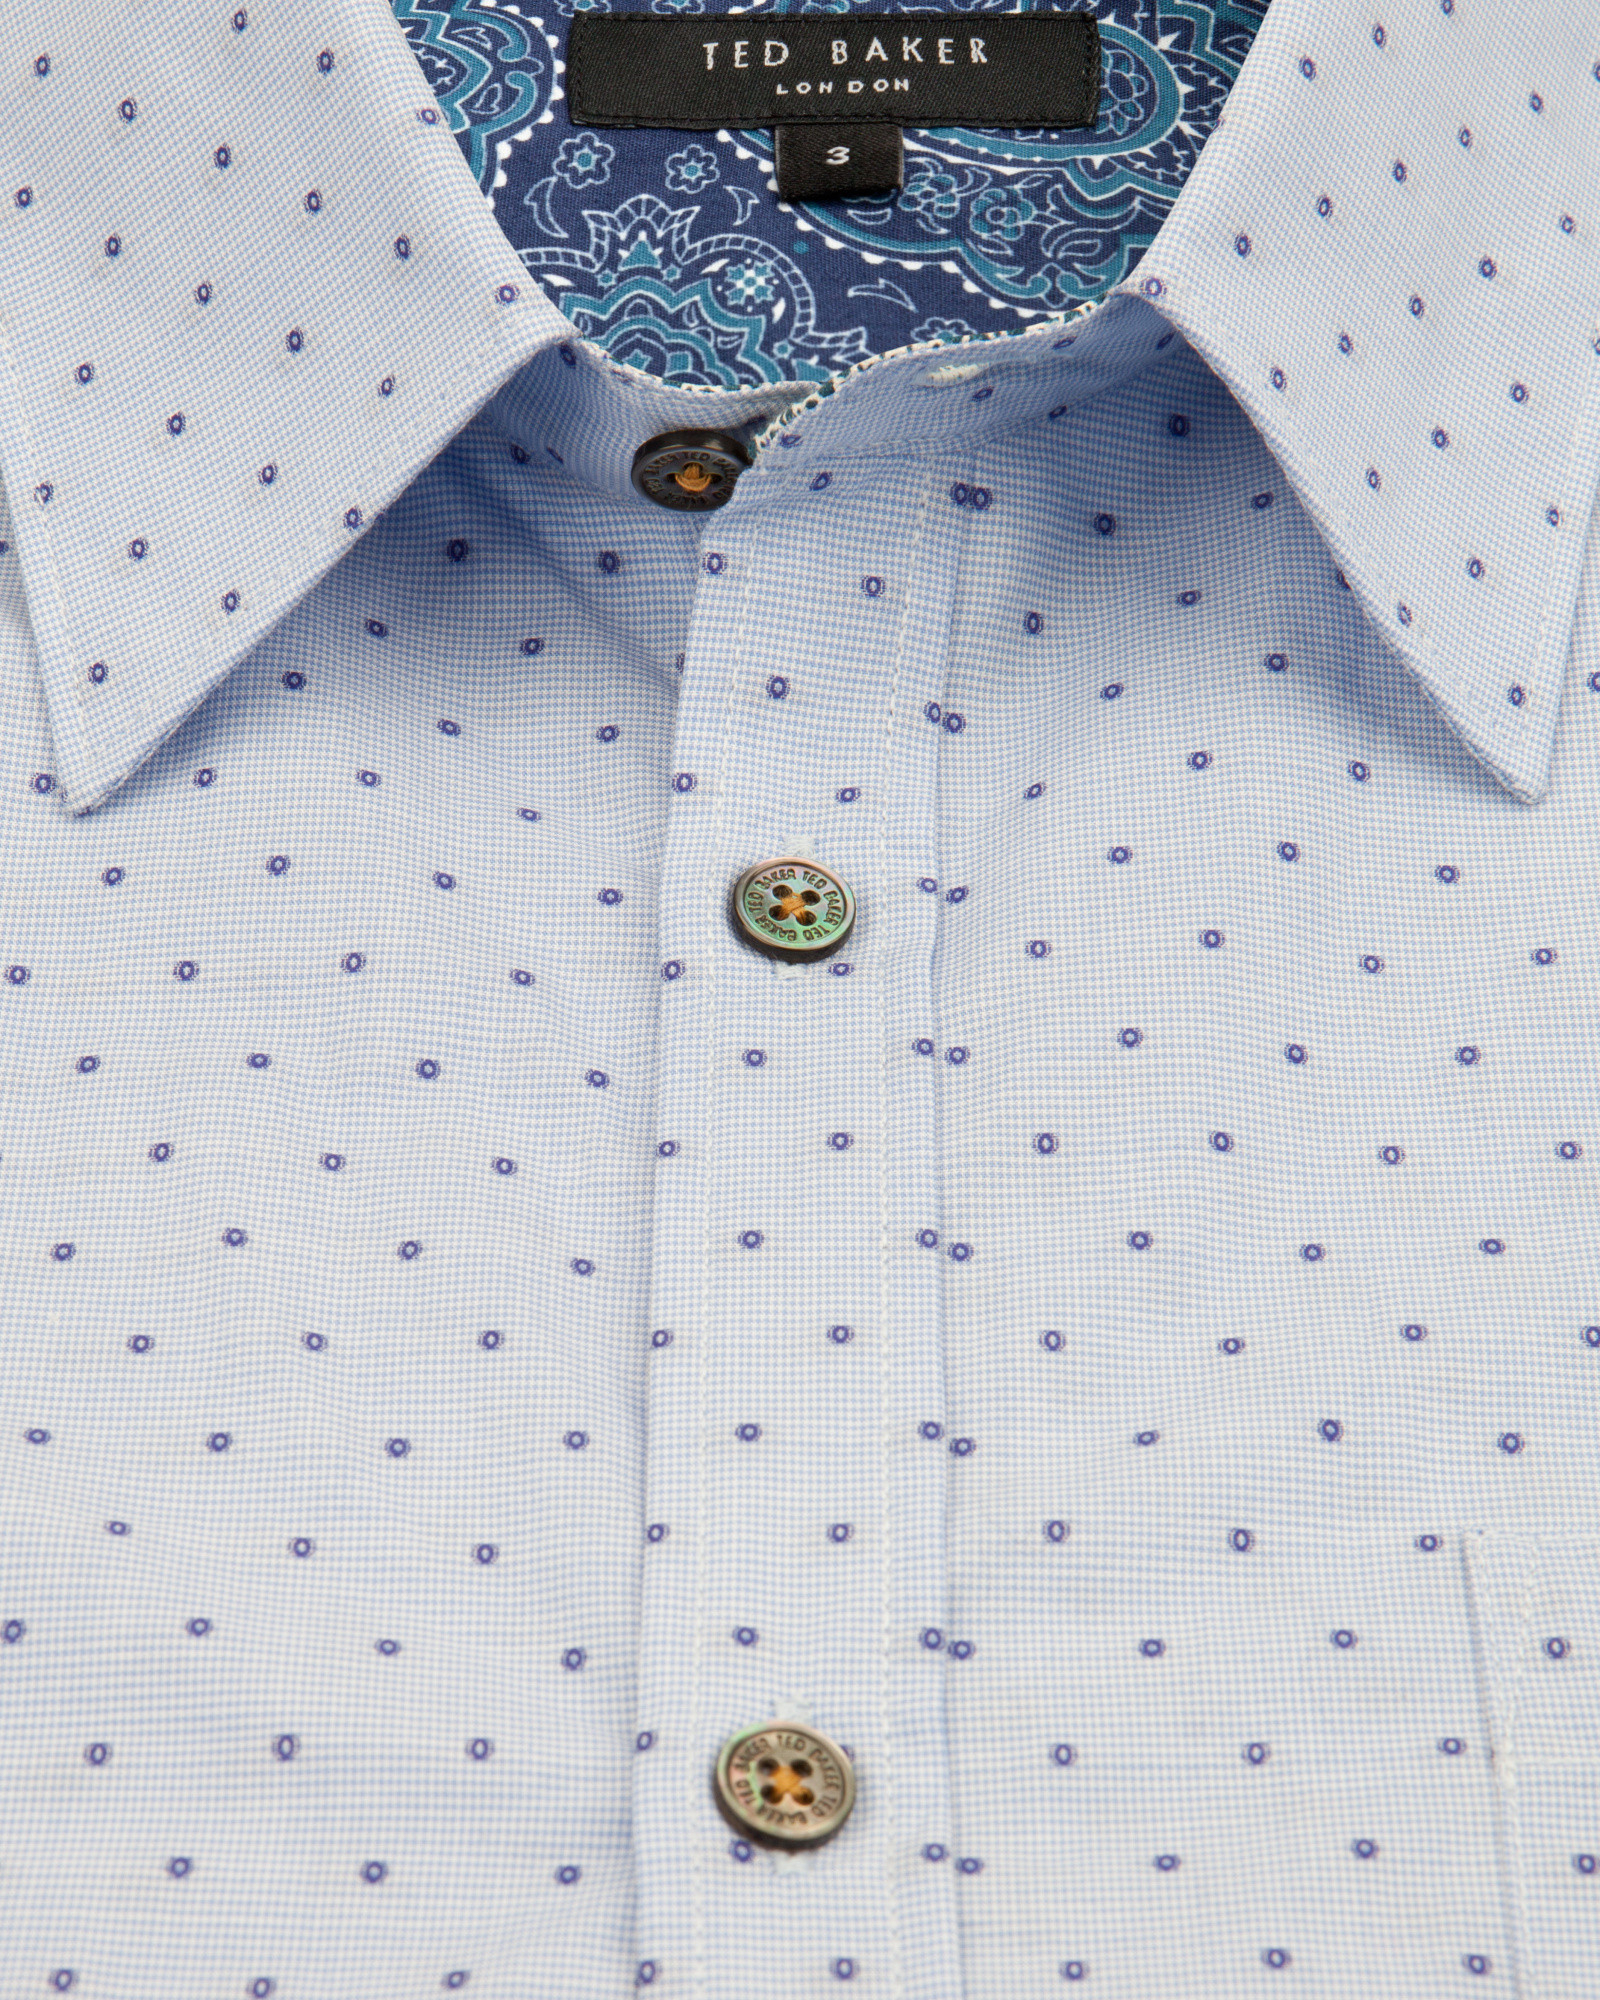 cb615a3d9212 Ted baker Cotton Fil Coupé Shirt in Blue for Men